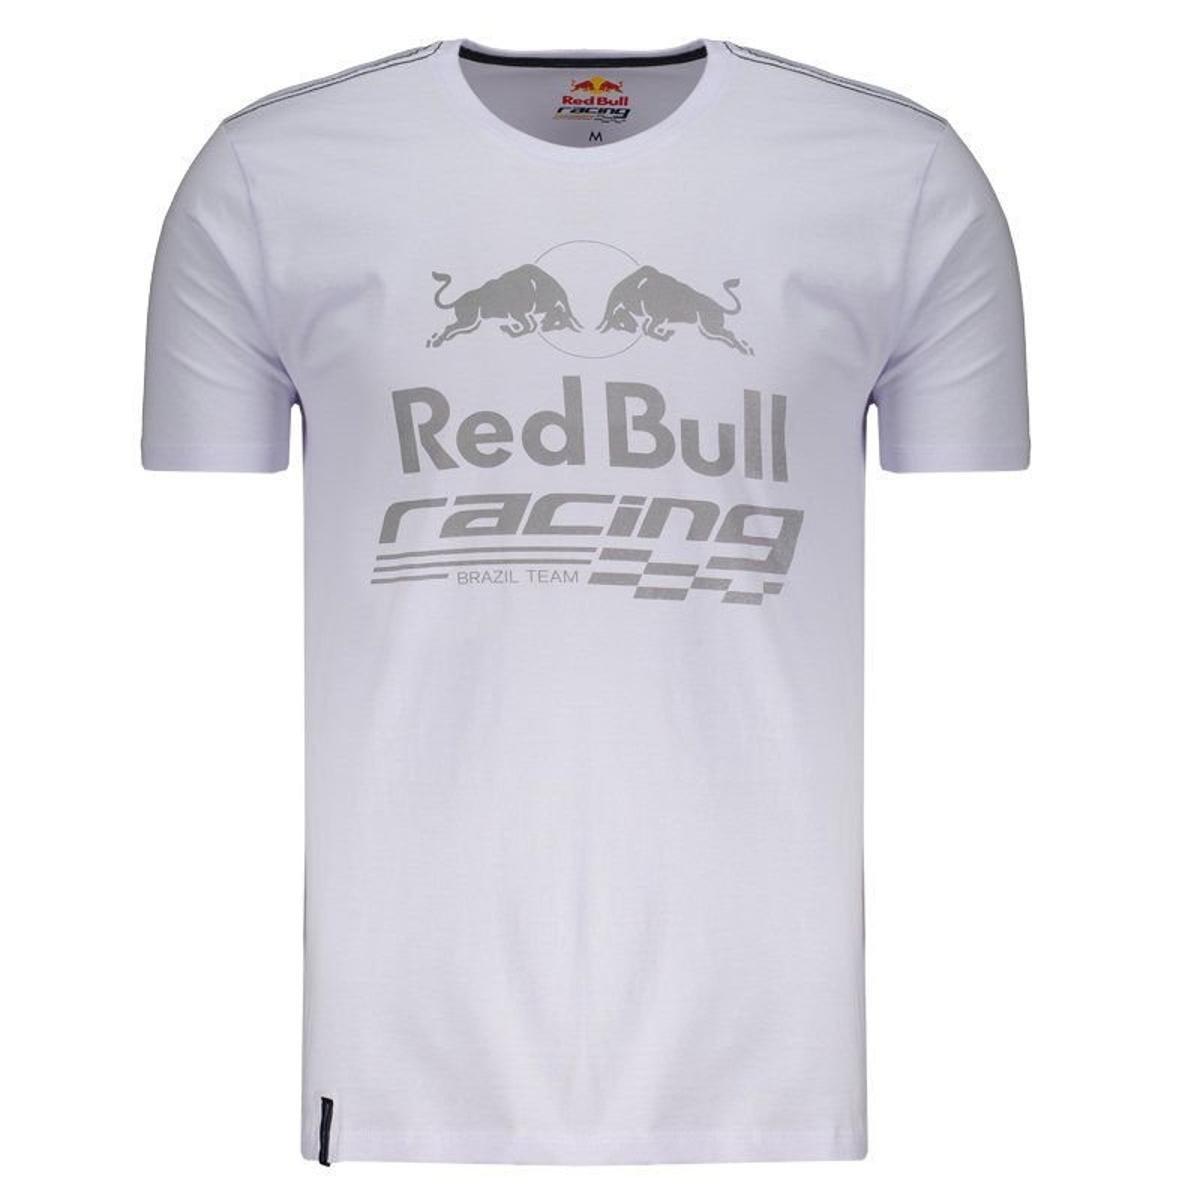 Camiseta Red Bull Racing Det Masculina - Branco - Compre Agora ... 8ce7dad01e5